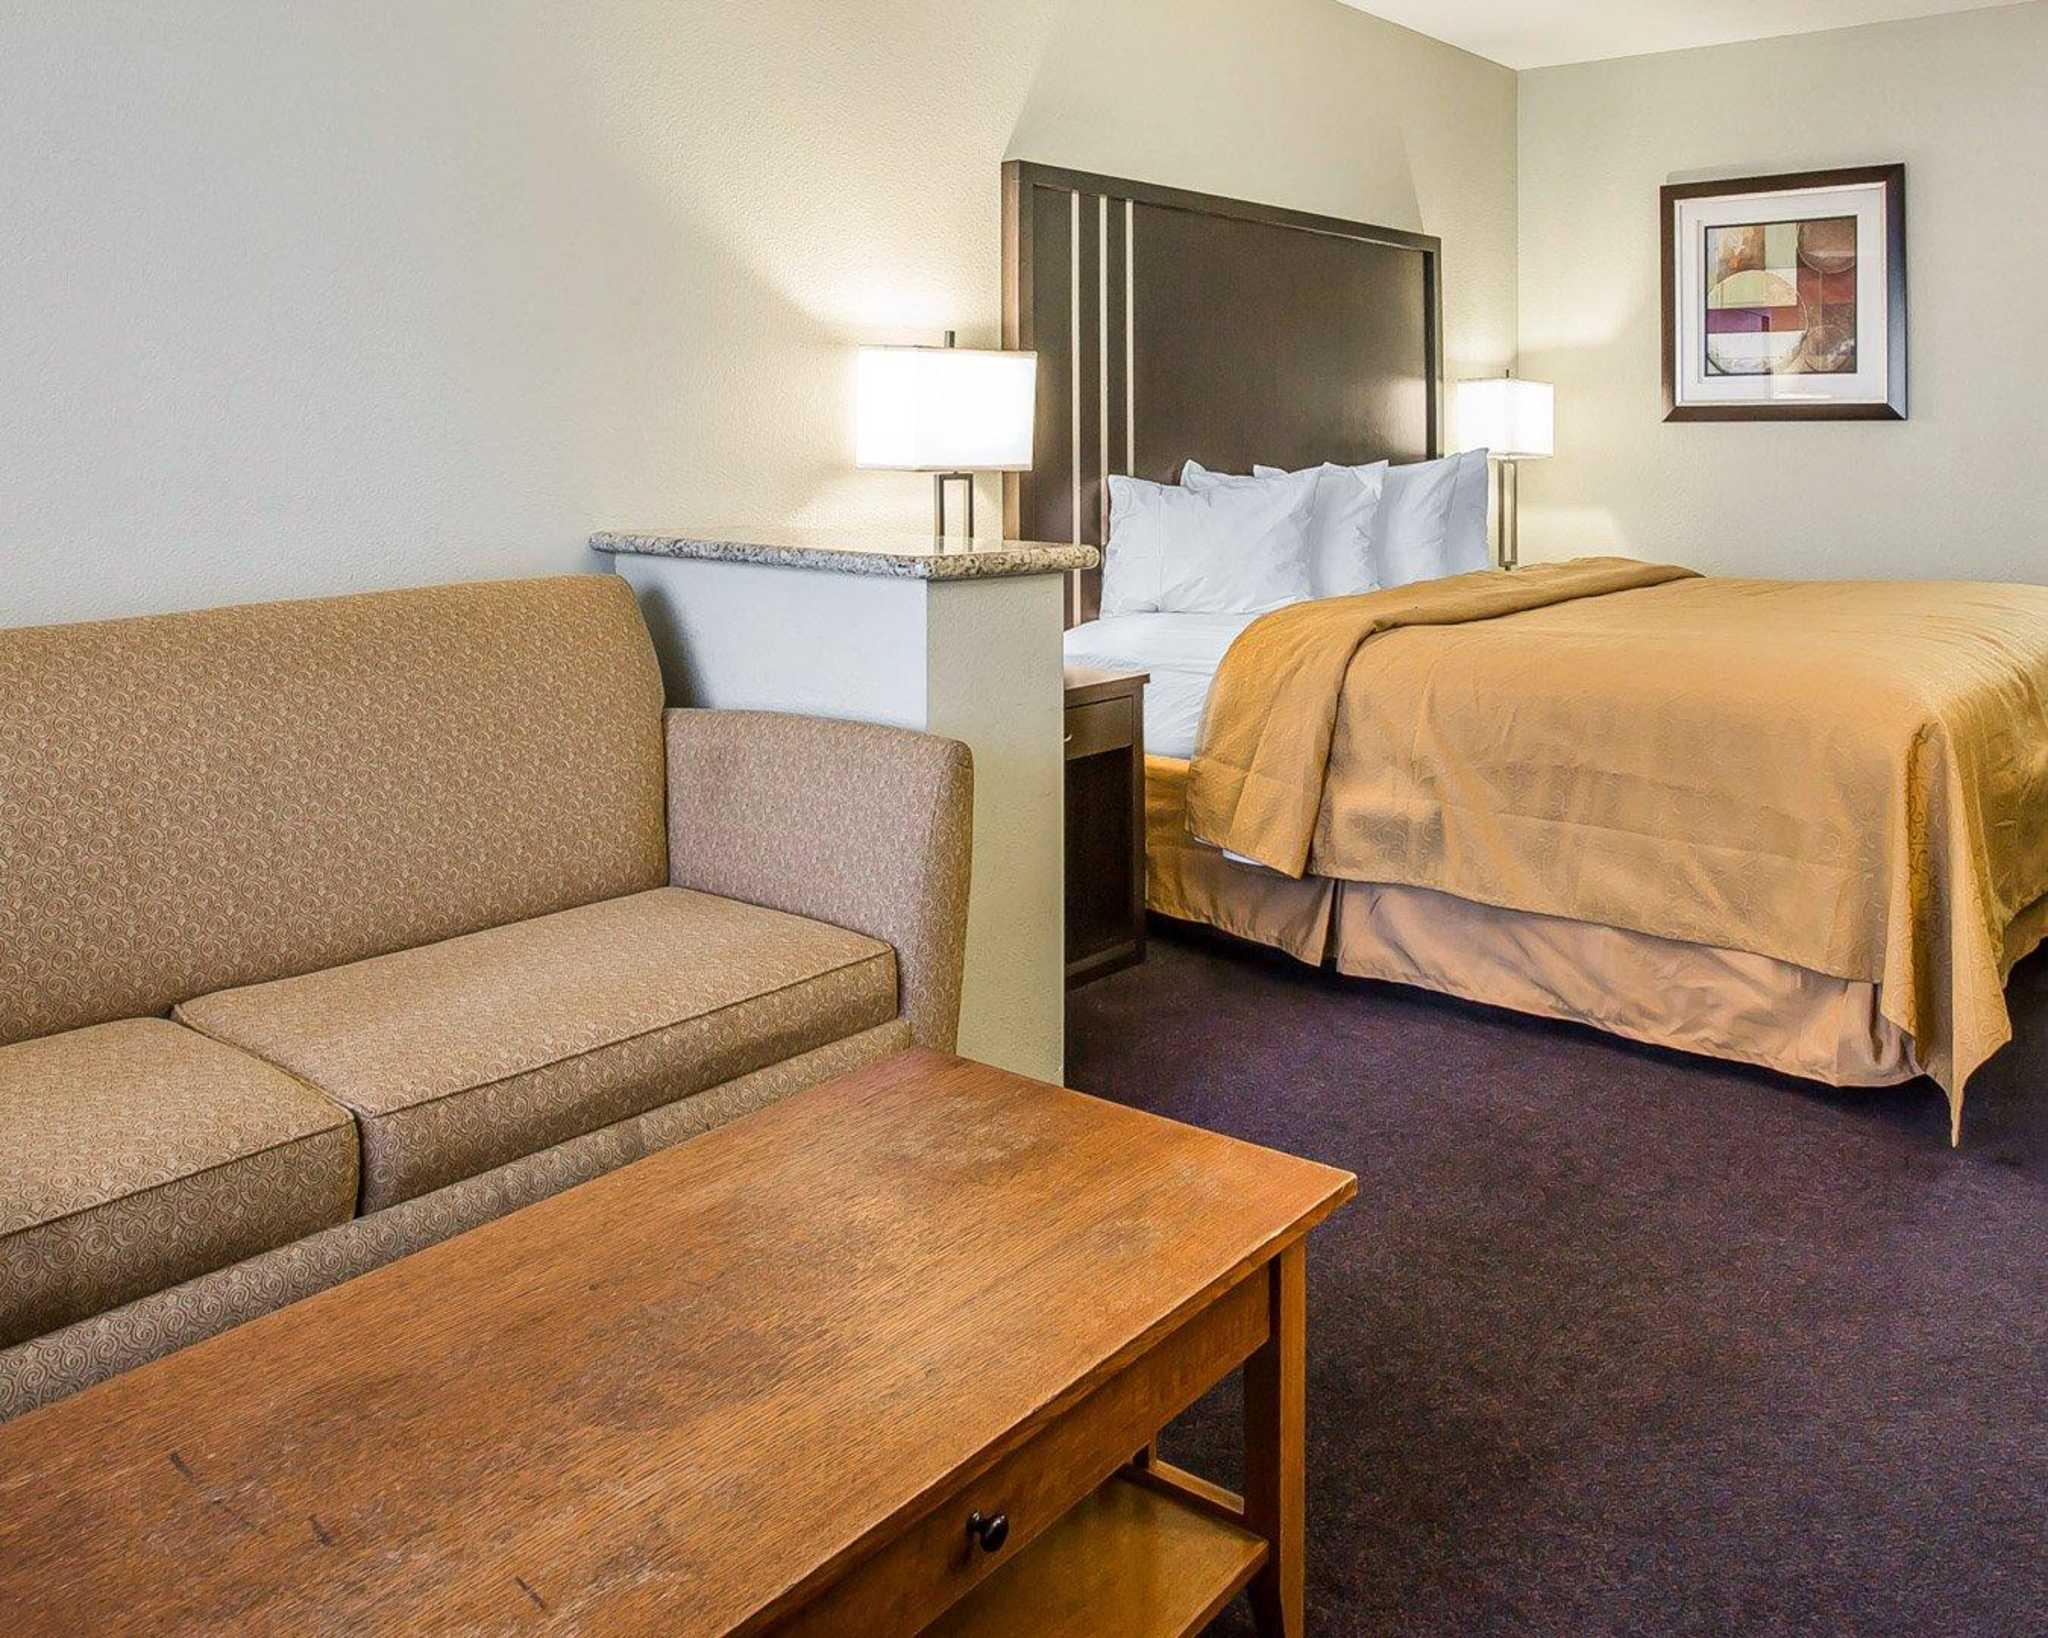 Quality Inn & Suites Woodland - Sacramento Airport image 25